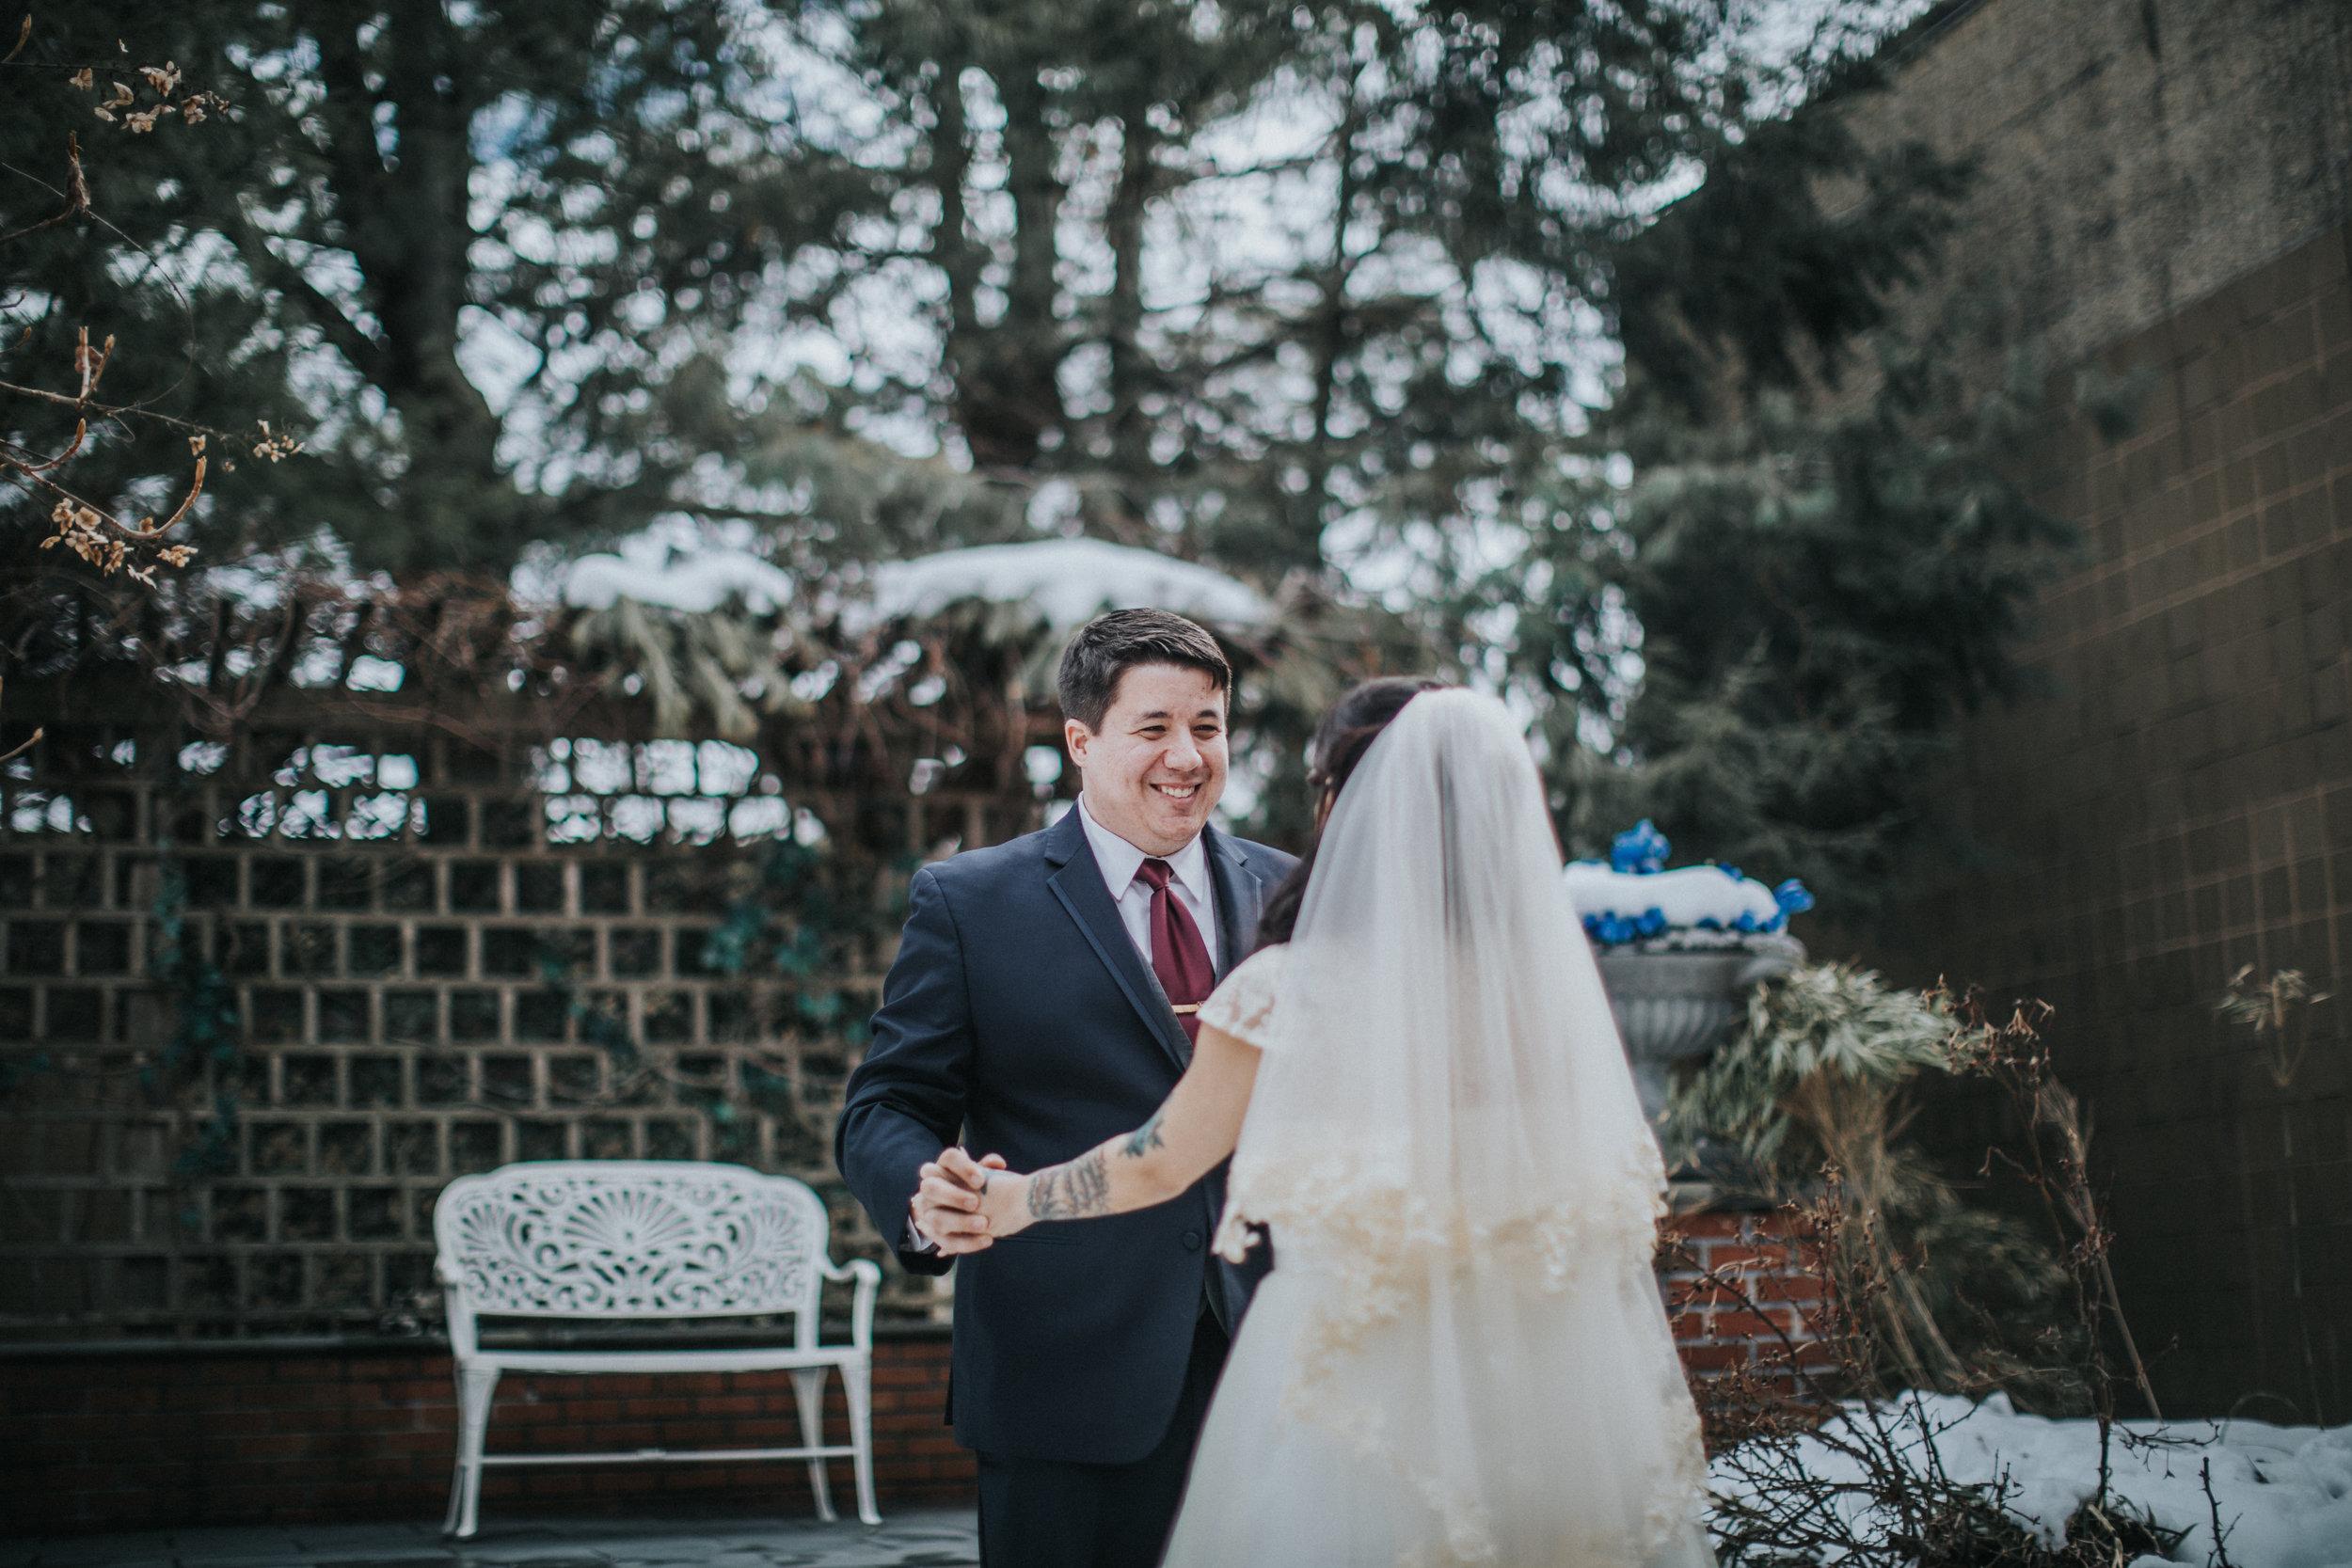 New-Jersey-Wedding-Photographer-ReceptionCenter-Valeria&Mike-First-Look-Bride&Groom (11 of 69).jpg